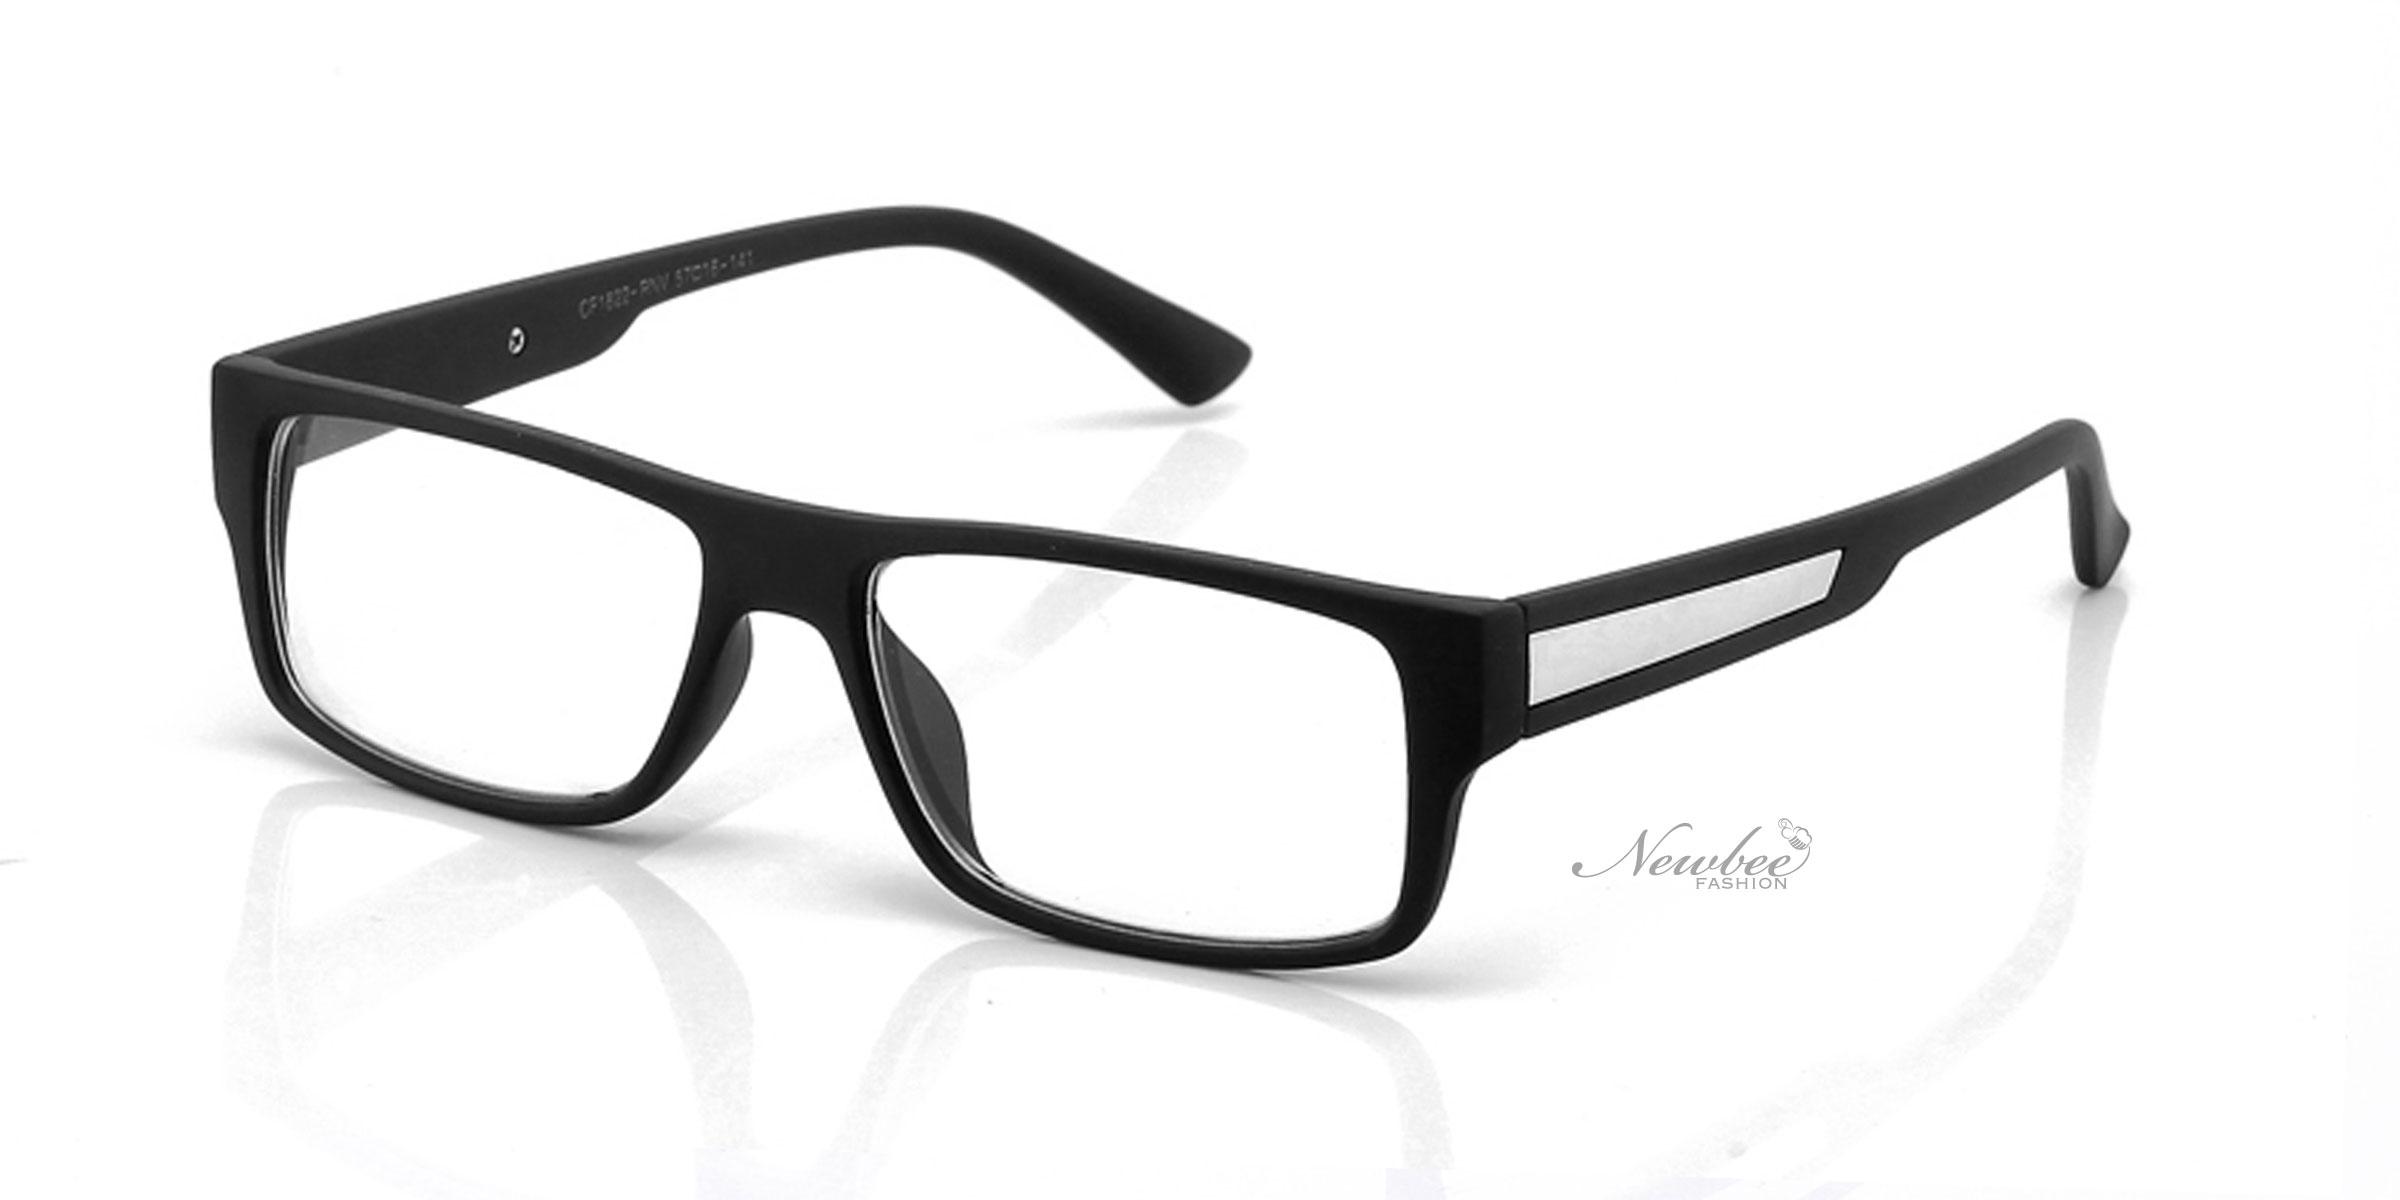 Black Frame Glasses Without Prescription : Classic Clear Lens Non Prescription Glasses with a Matte ...